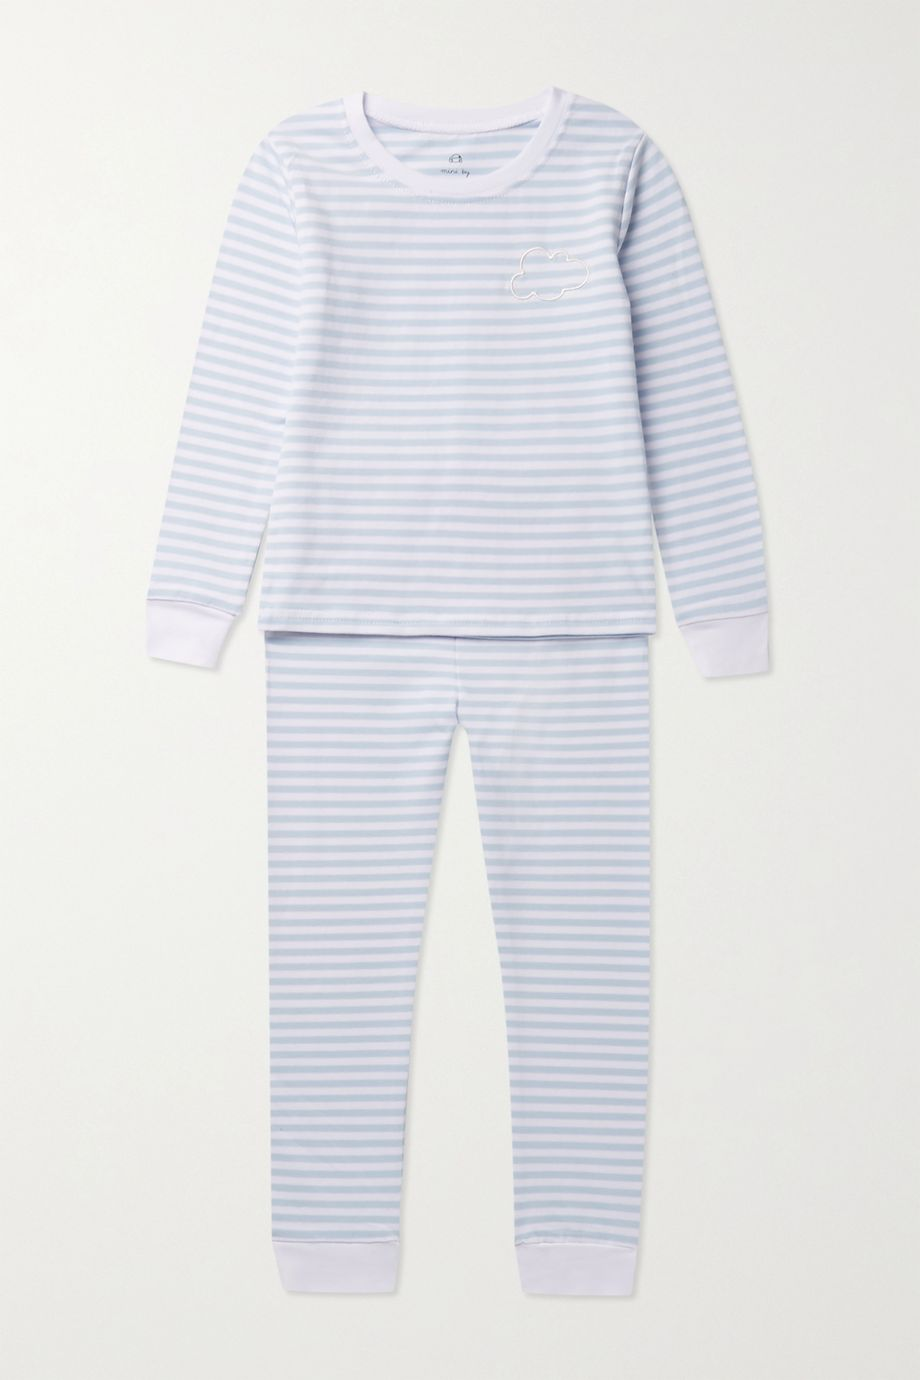 Morgan Lane Kids 【1 - 8 岁】Lulu 印花弹力棉质平纹布睡衣套装